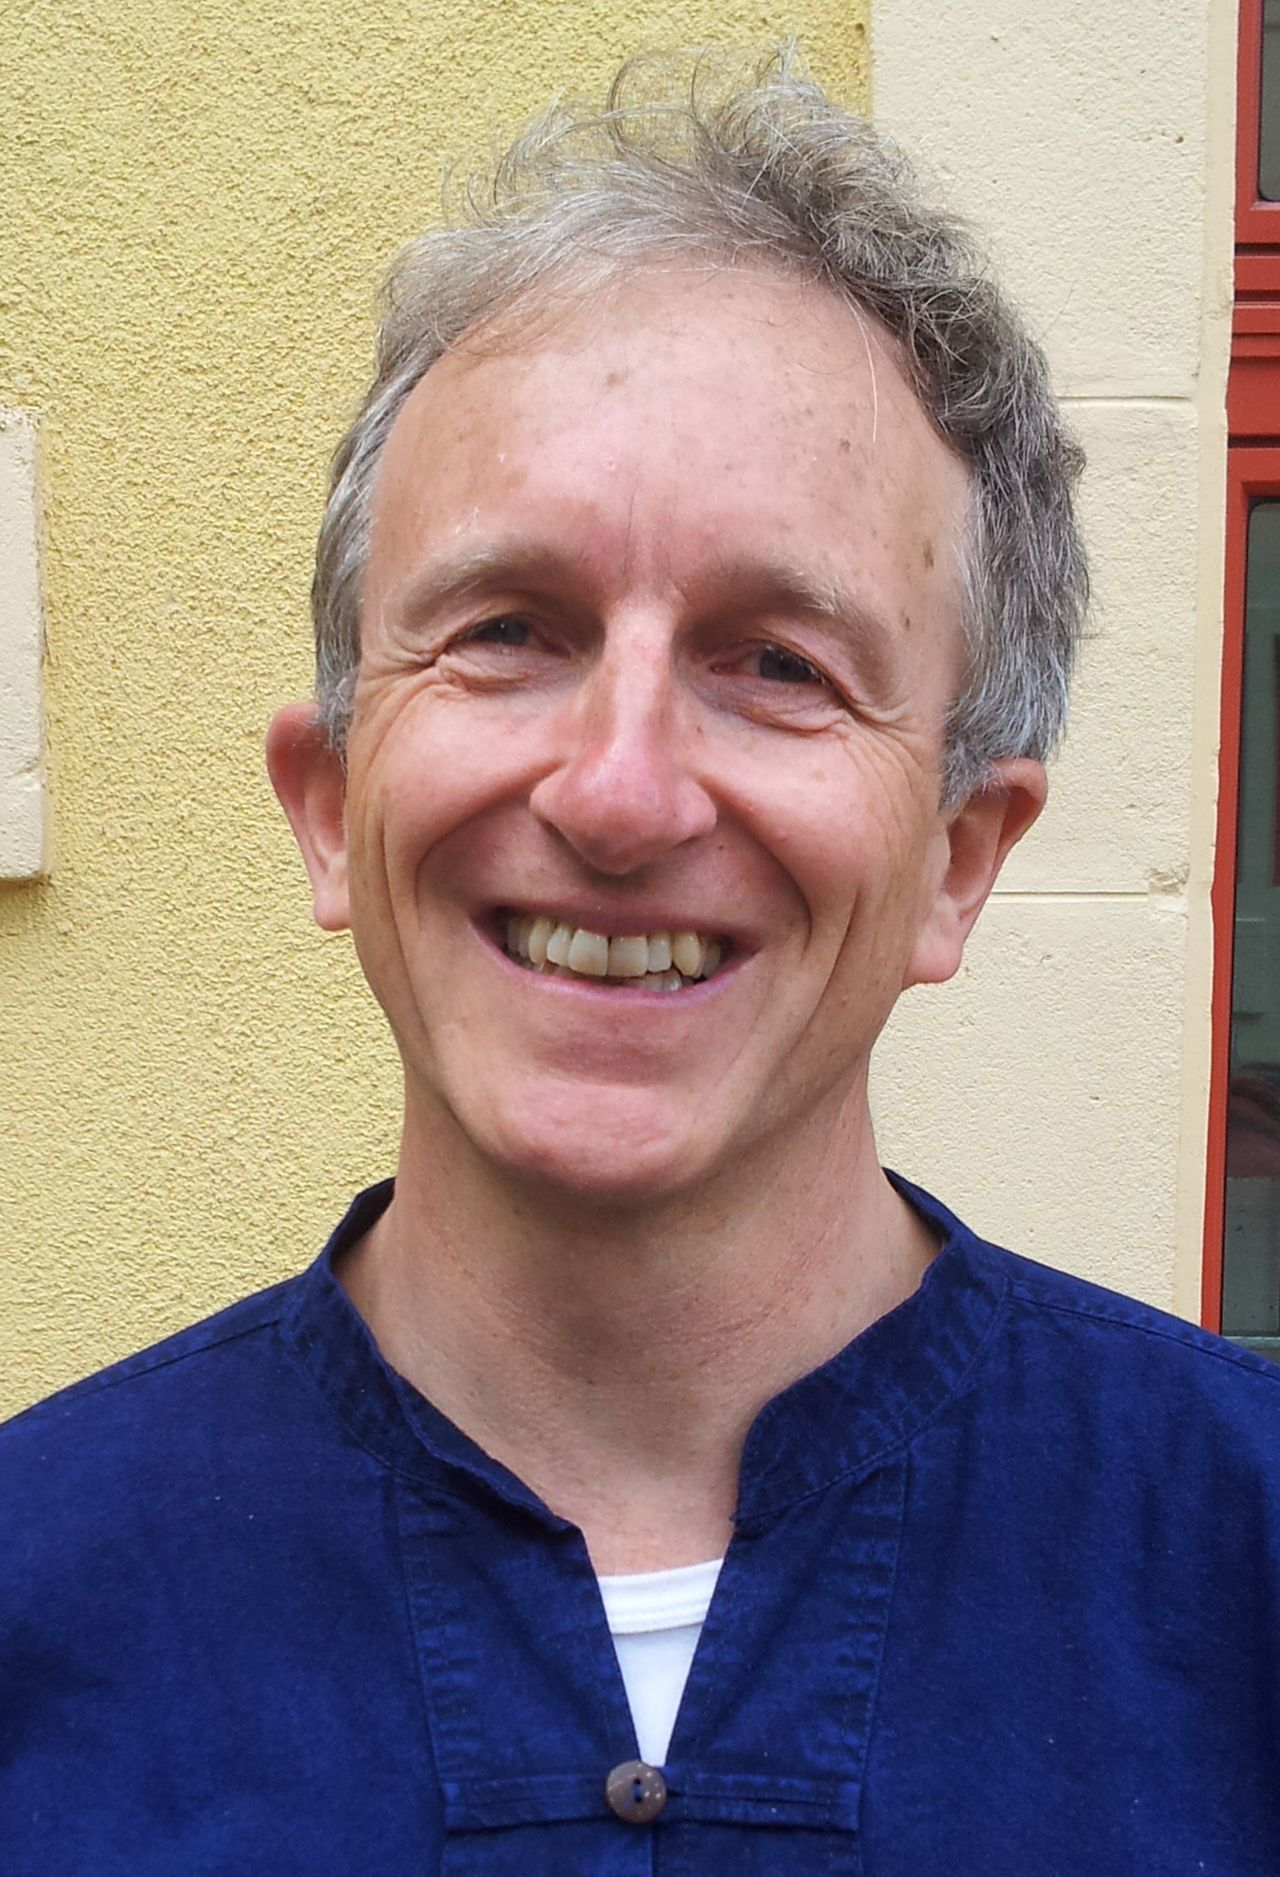 Pierre-André Jeannin